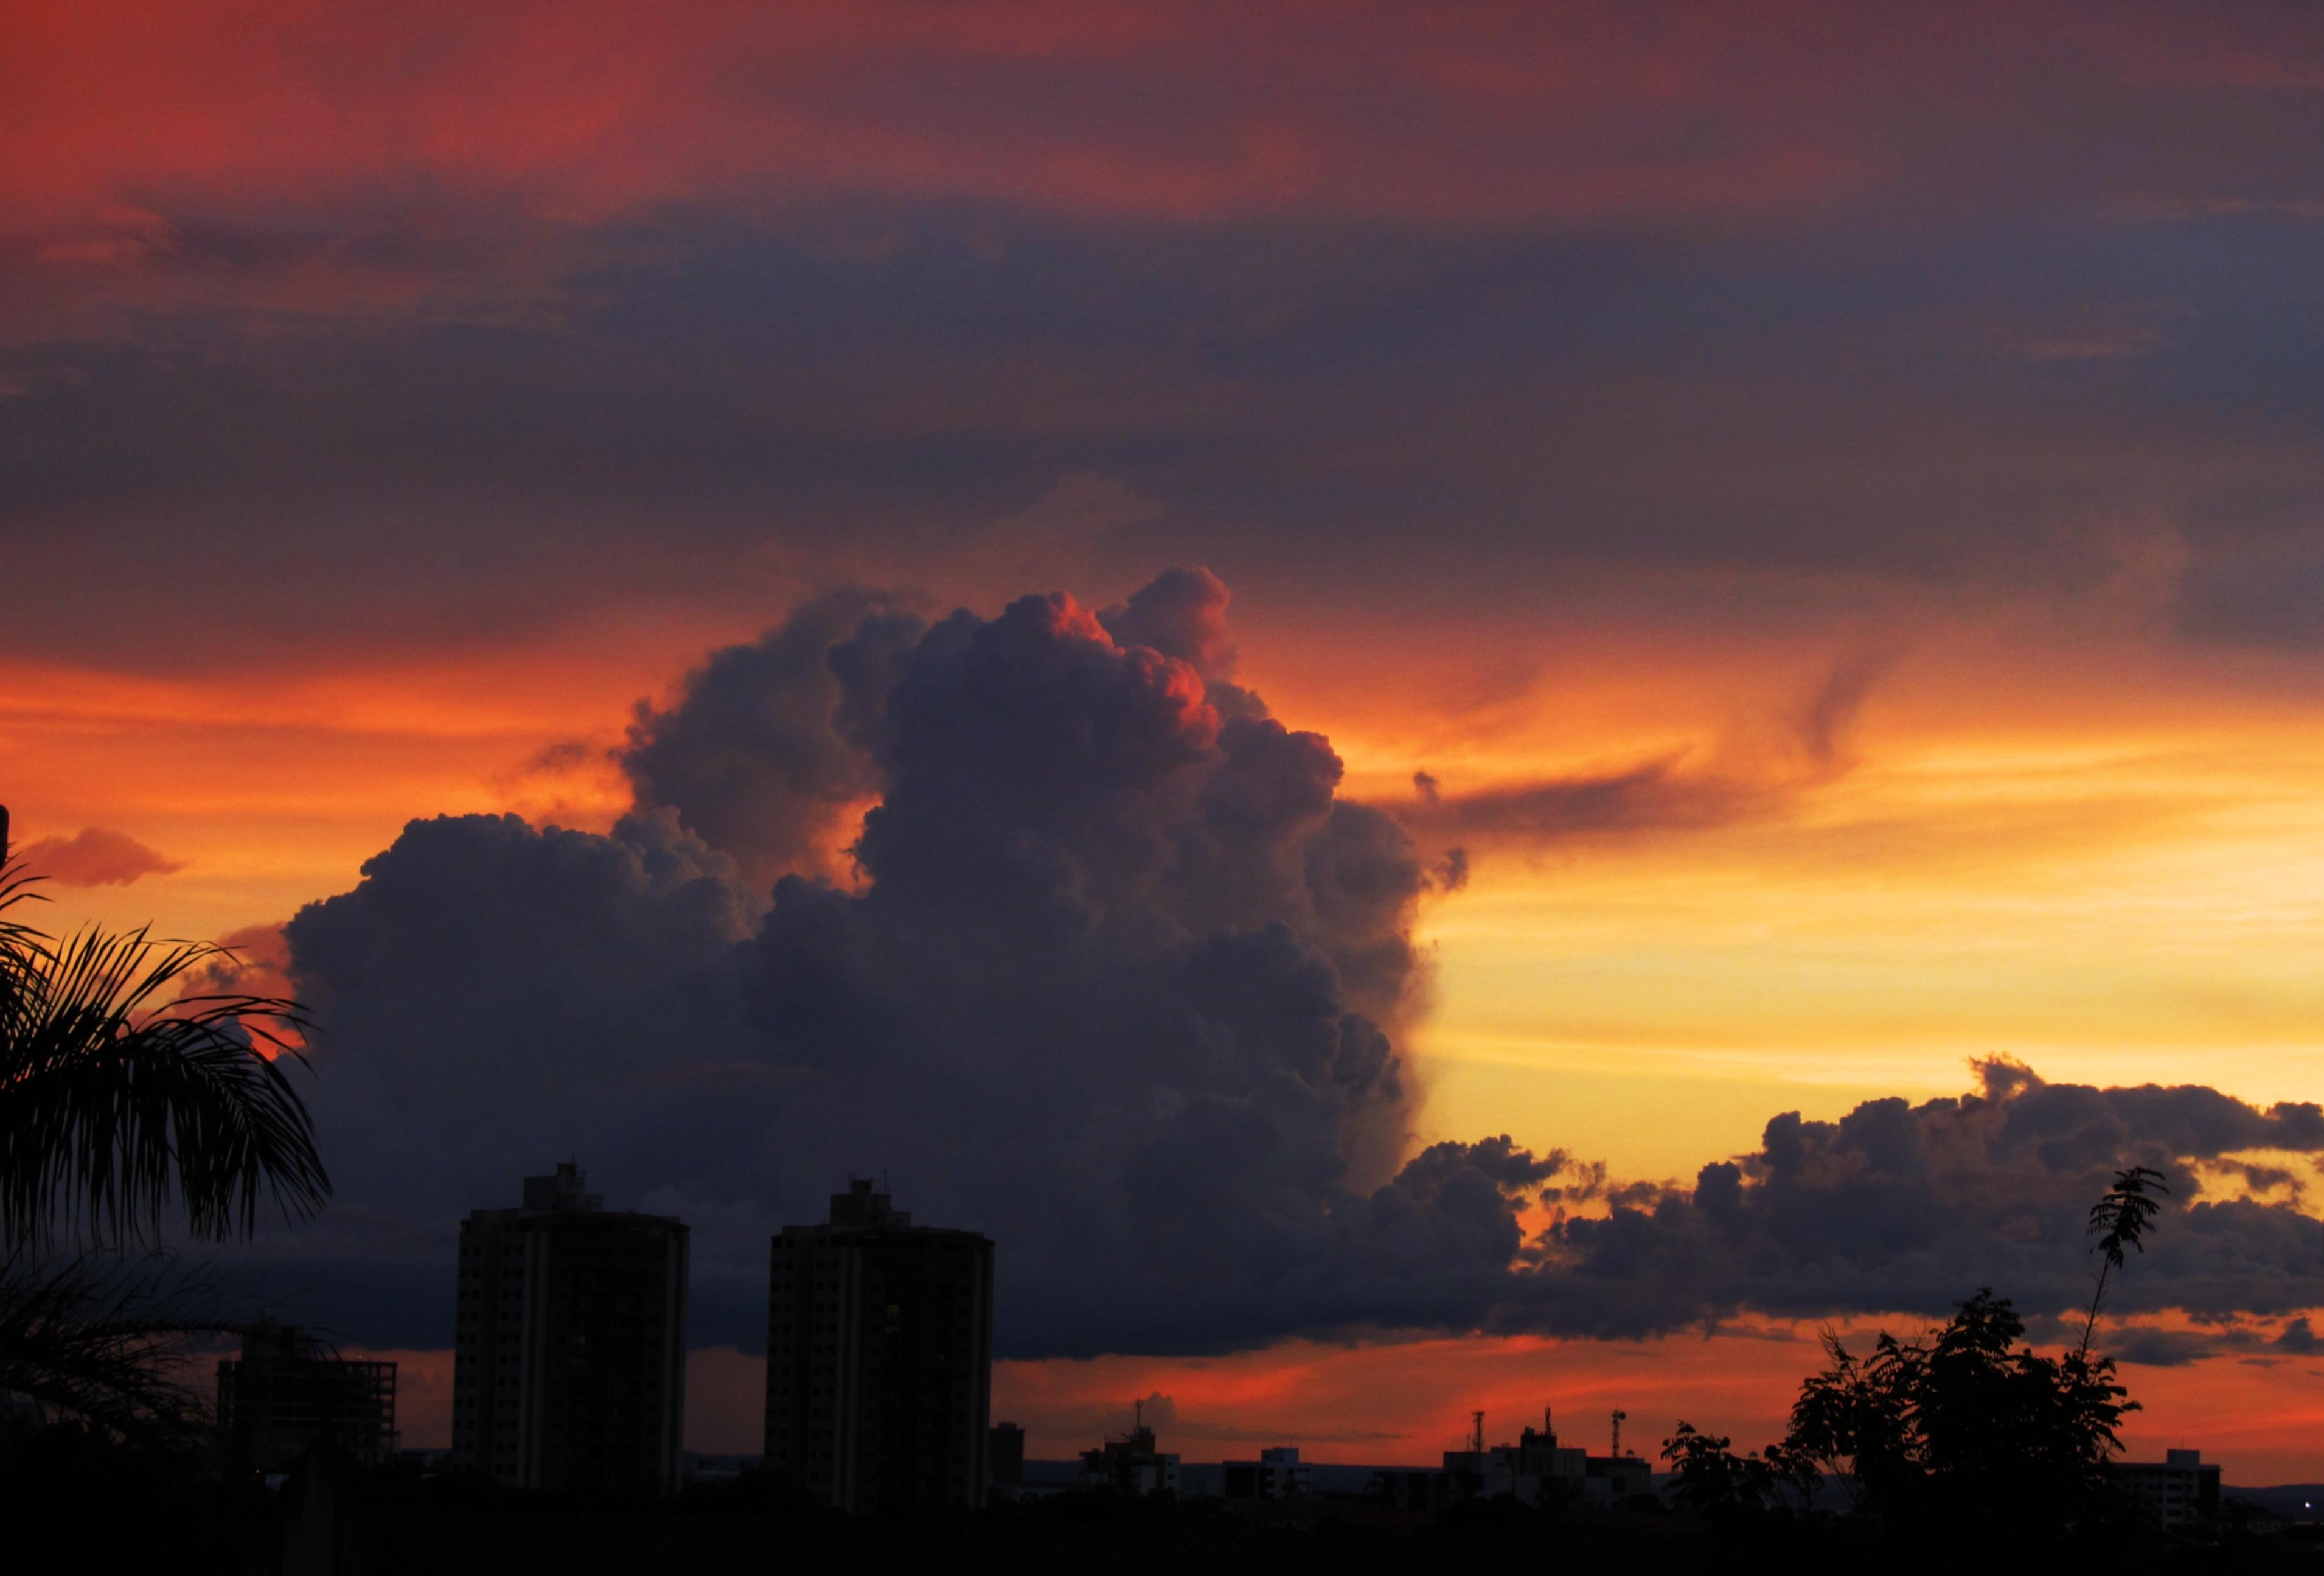 Wallpaper Sunlight Landscape Sunset City Building Clouds